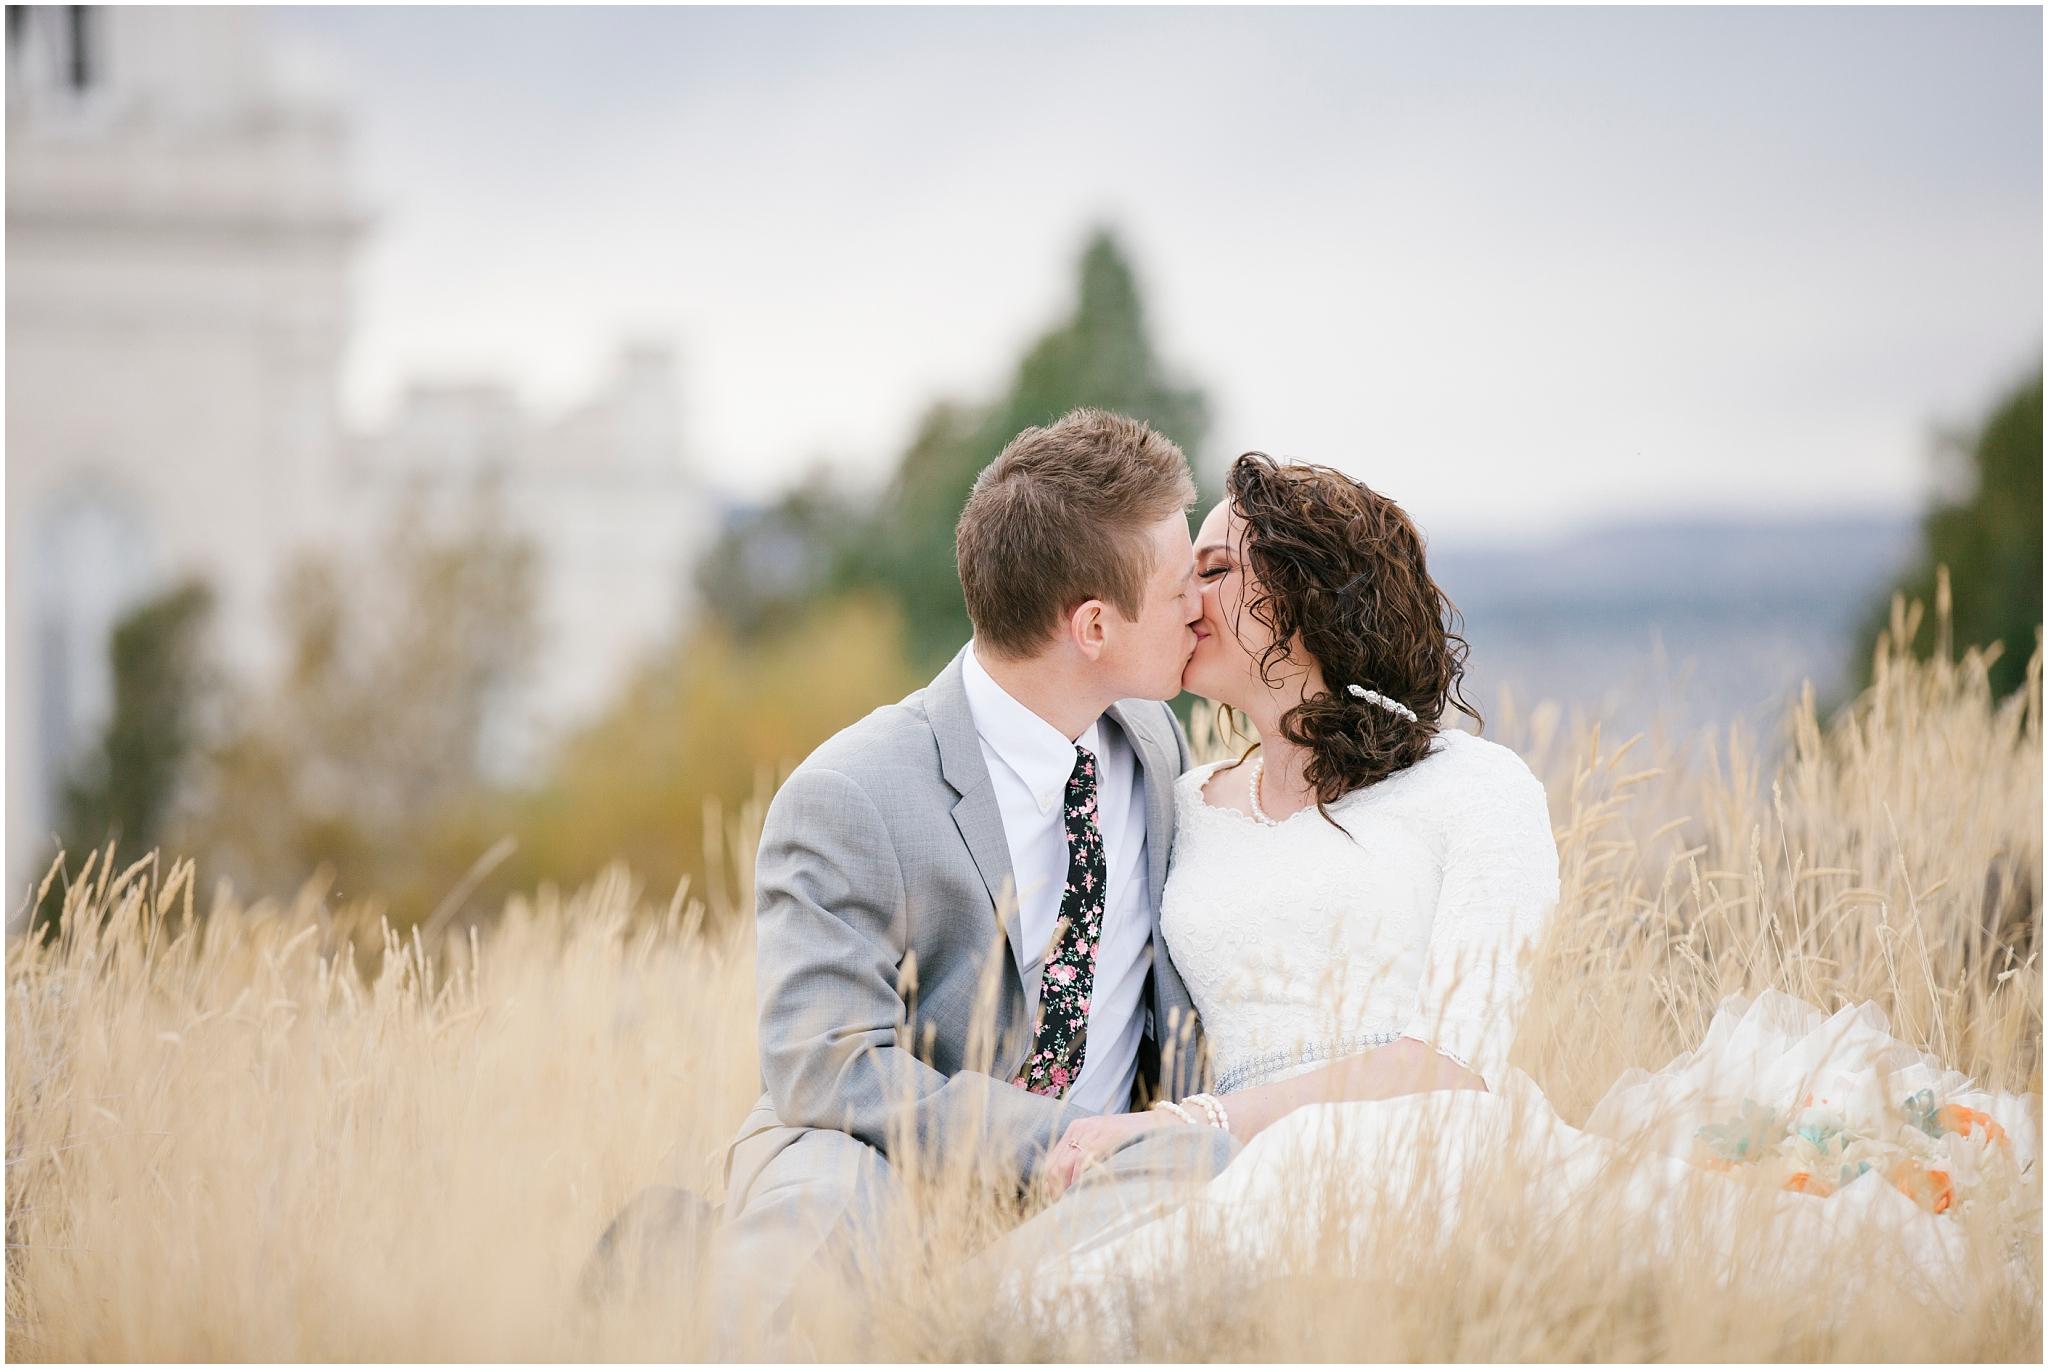 BA-Bridals-174_Lizzie-B-Imagery-Utah-Wedding-Photographer-Central-Utah-Photographer-Utah-County-Manti-Utah-Temple.jpg